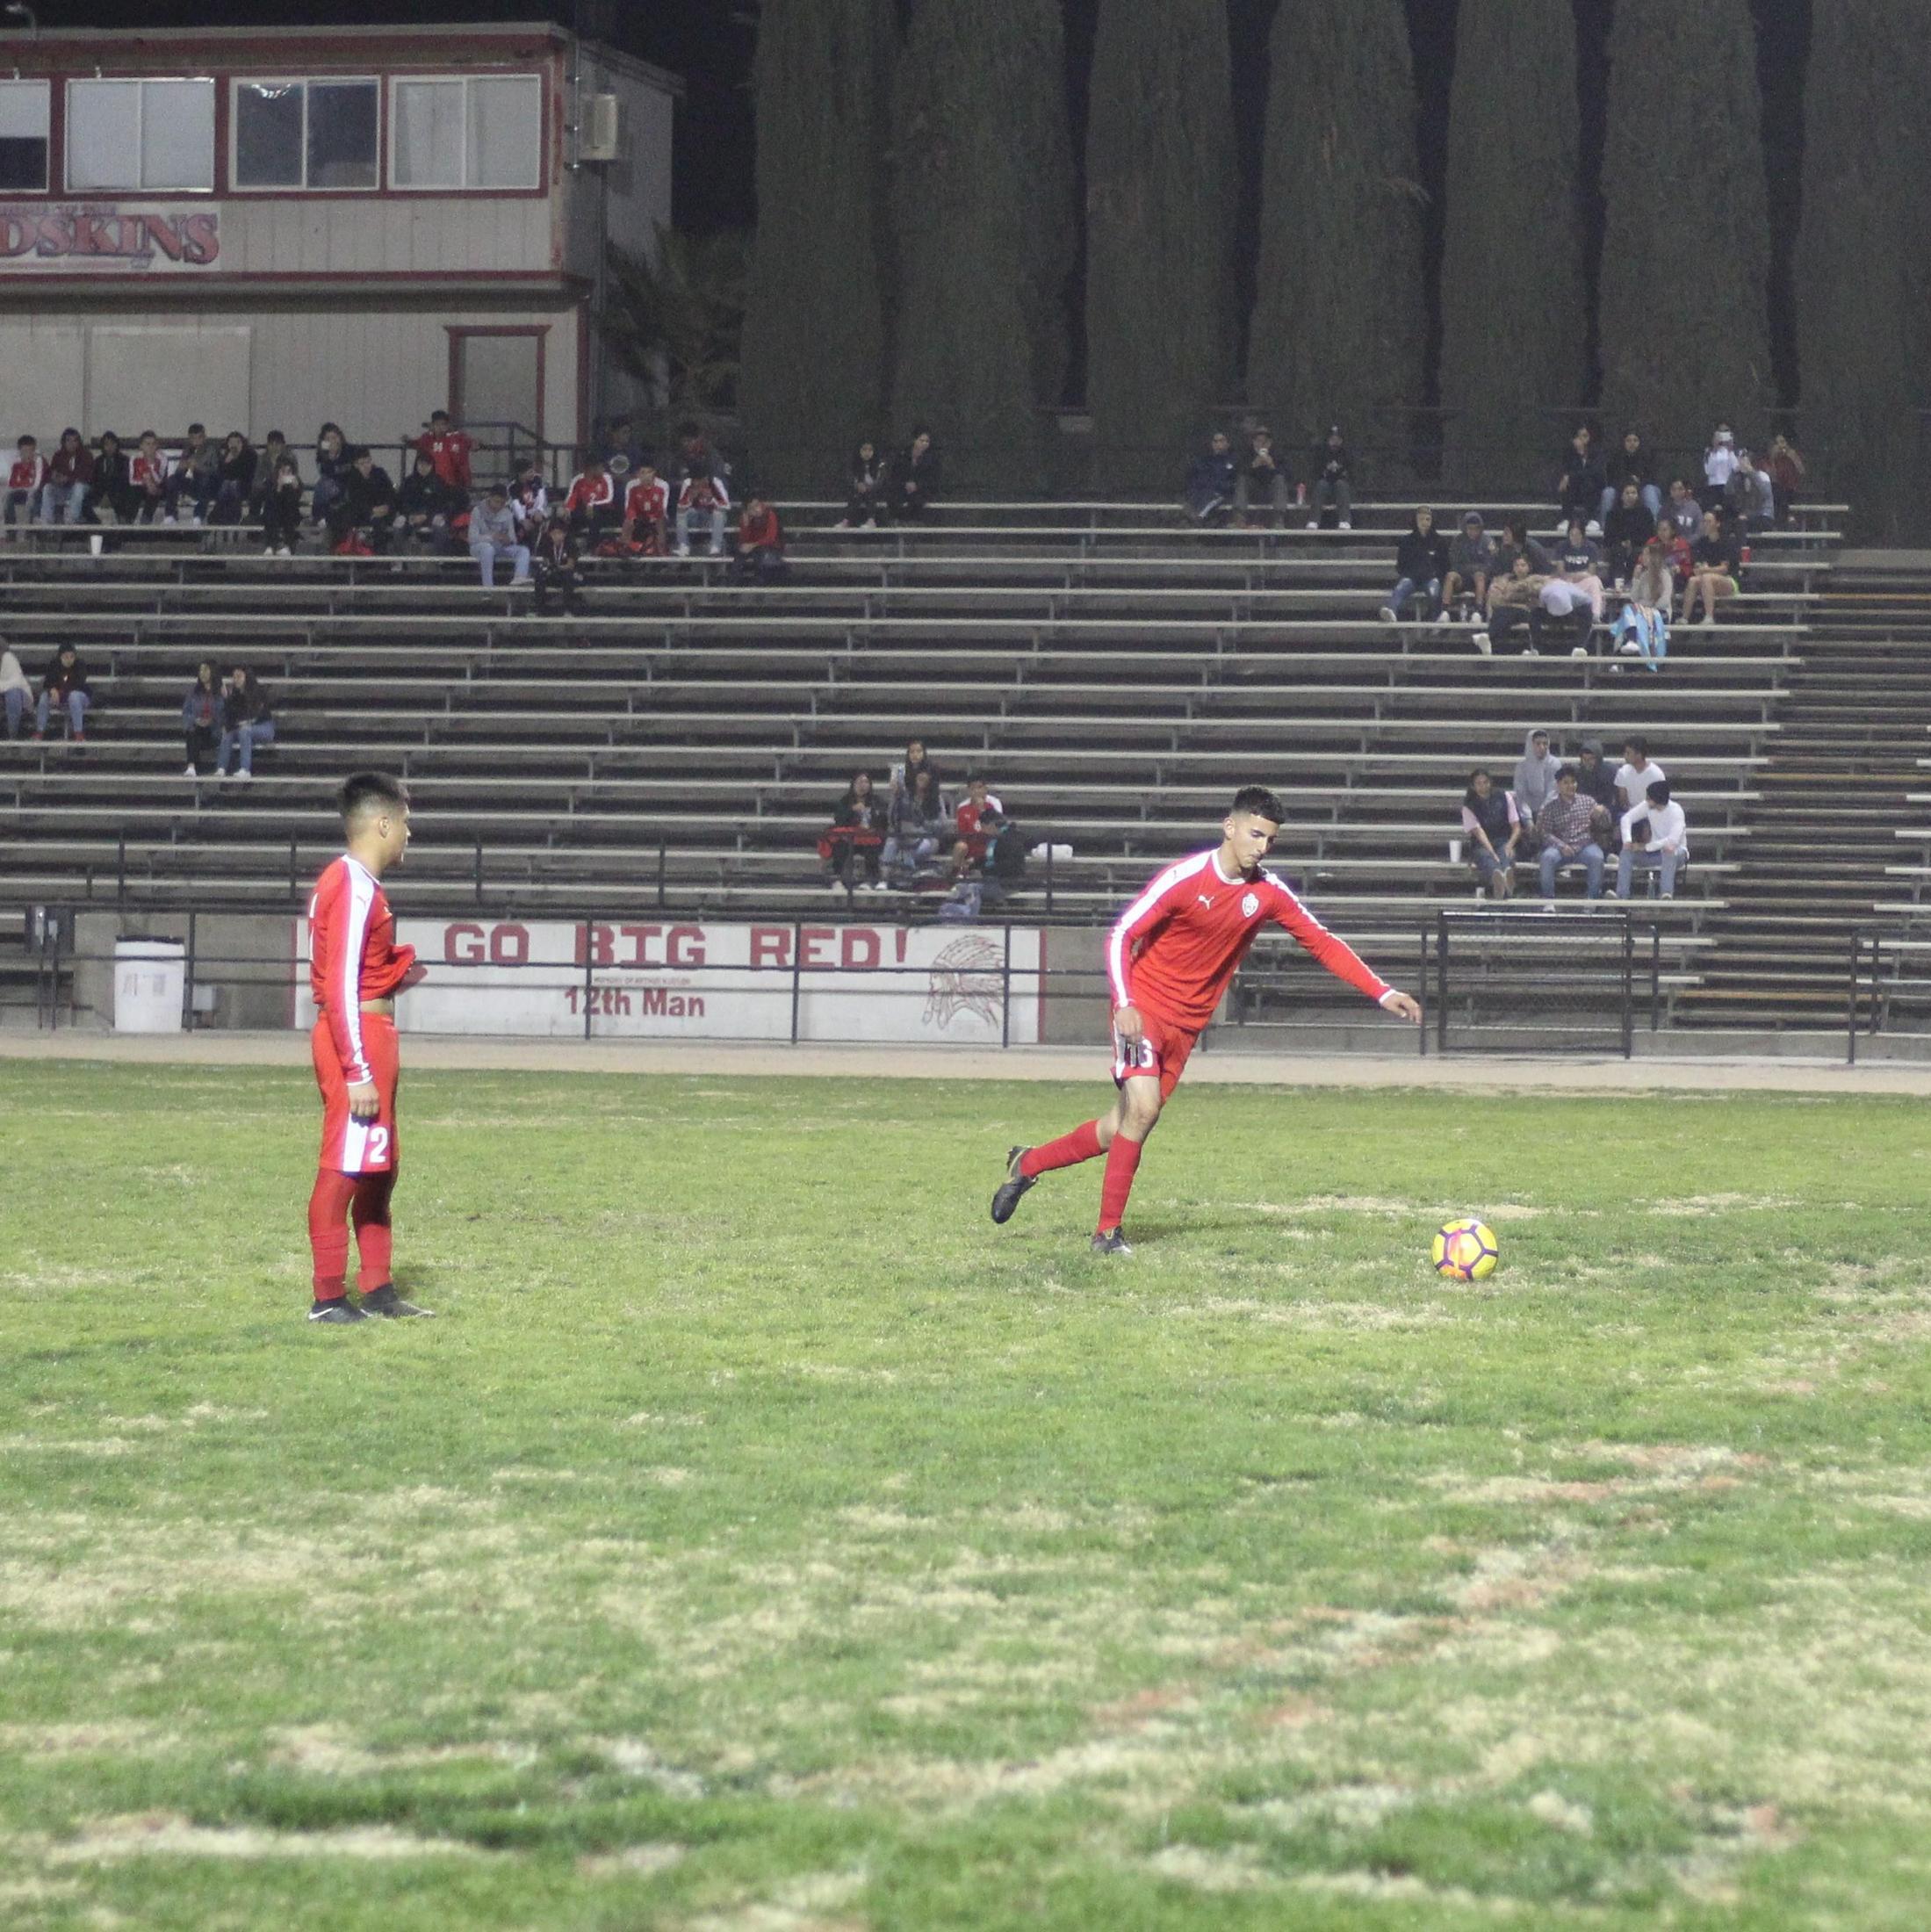 Christian Fernandez running to kick the ball